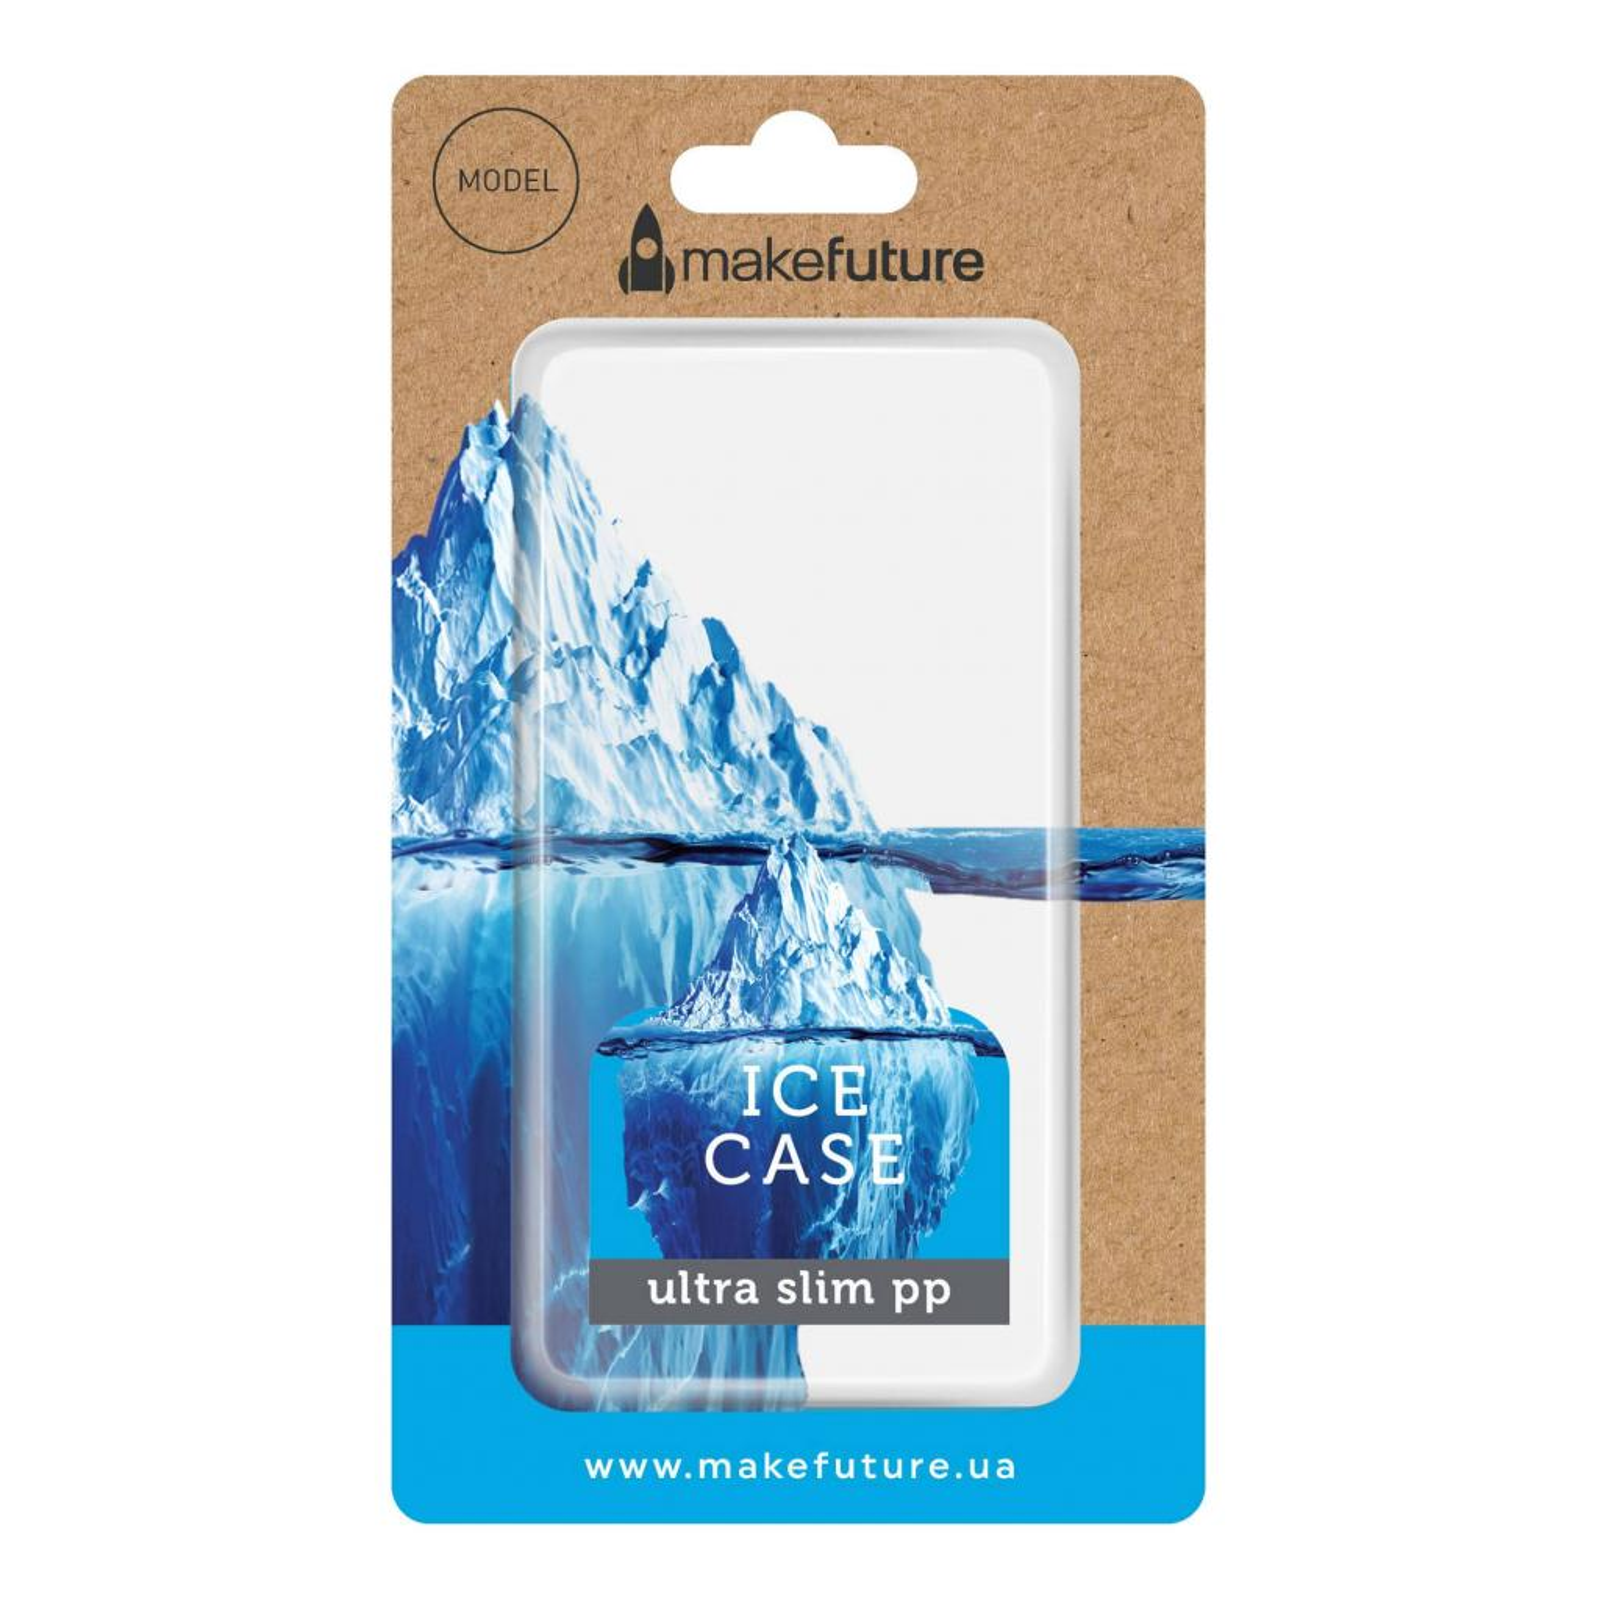 Чехол для моб. телефона MakeFuture Ice Case (PP) для Apple iPhone 6 White (MCI-AI6WH) изображение 5